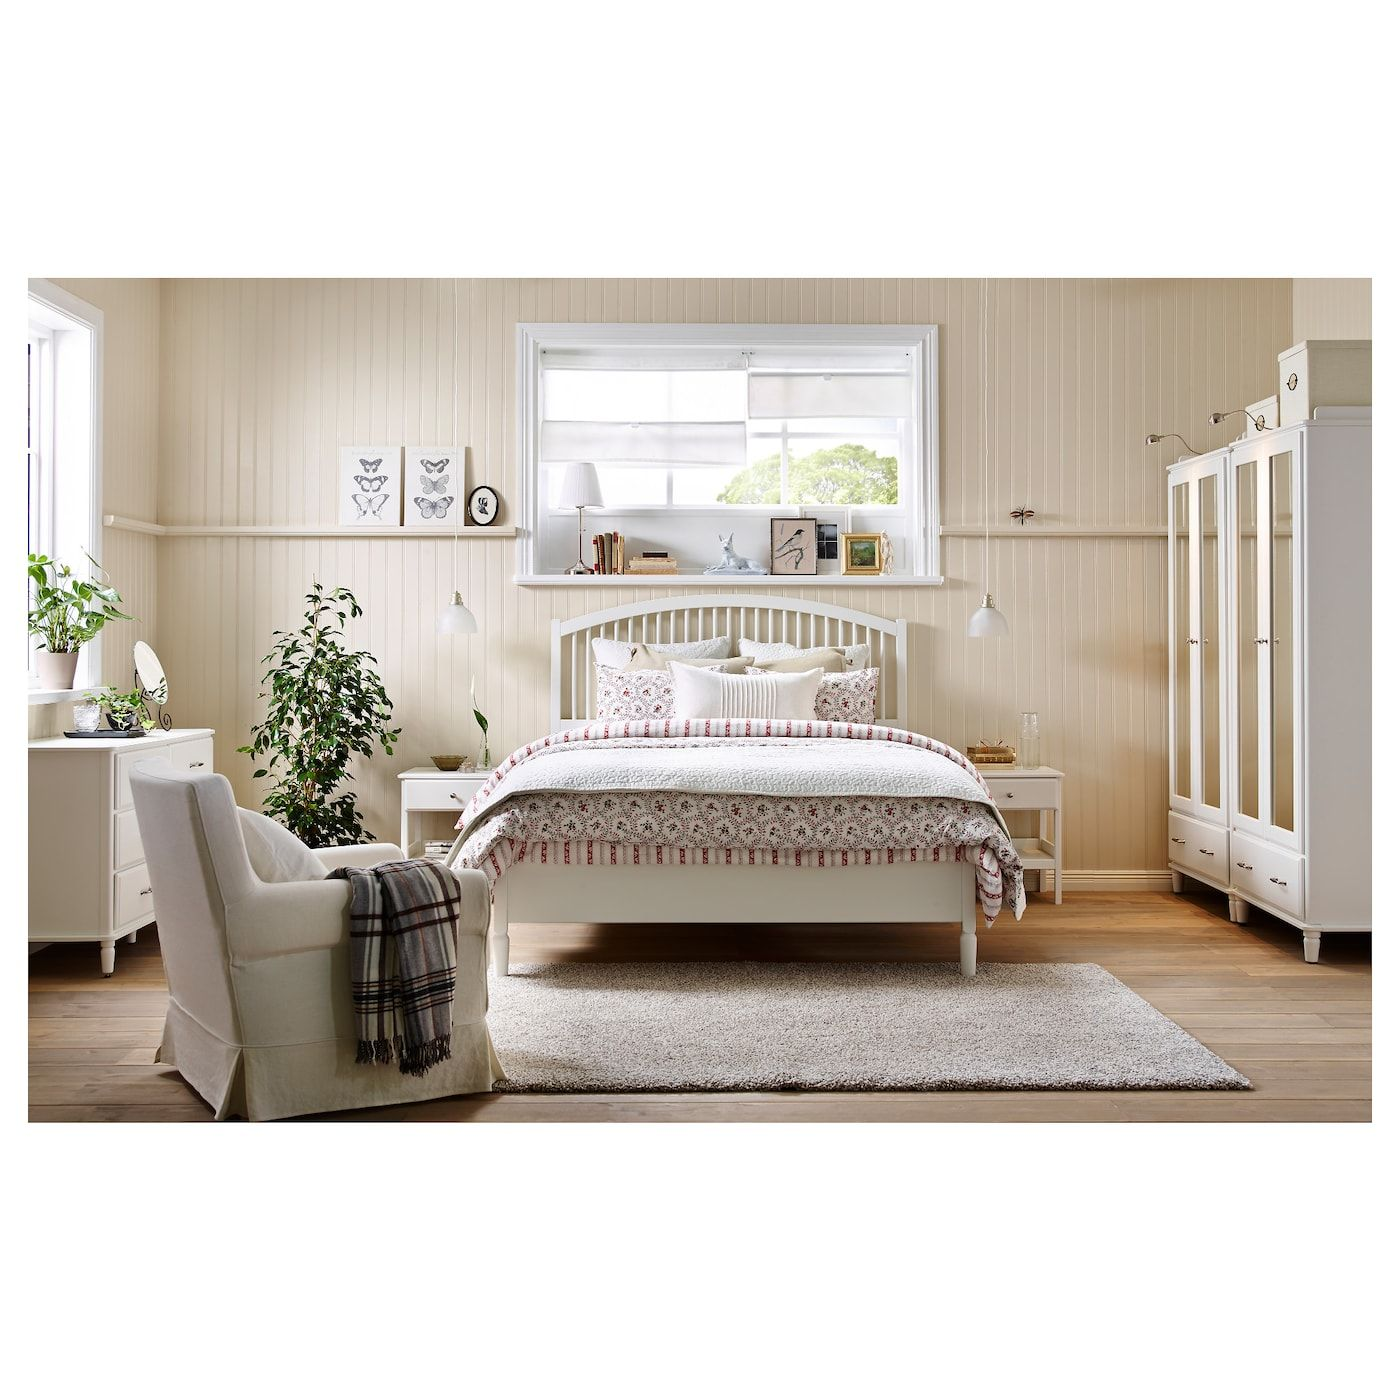 Tyssedal Cadre De Lit Blanc 160x200 Cm Ikea In 2020 Cheap Furniture Stores Bedroom Sets Bedroom Design